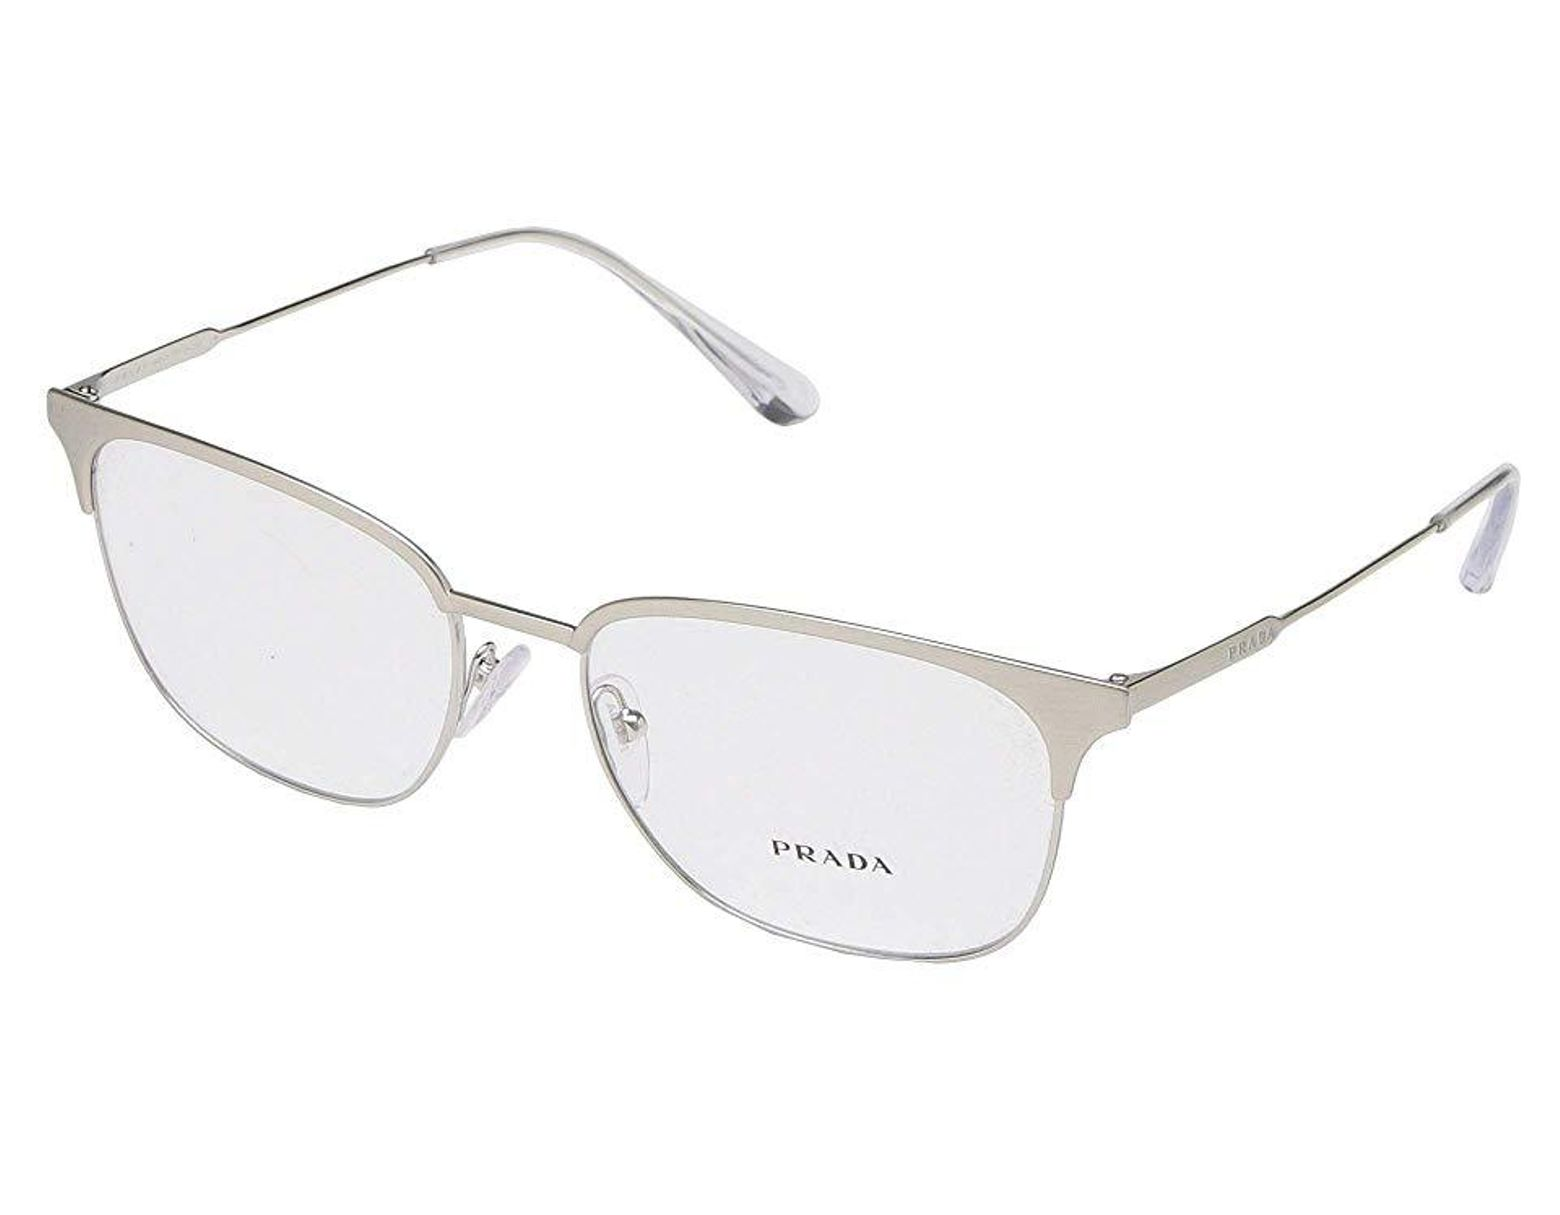 319bf3193 Prada 0pr 59uv (silver) Fashion Sunglasses in Metallic - Lyst